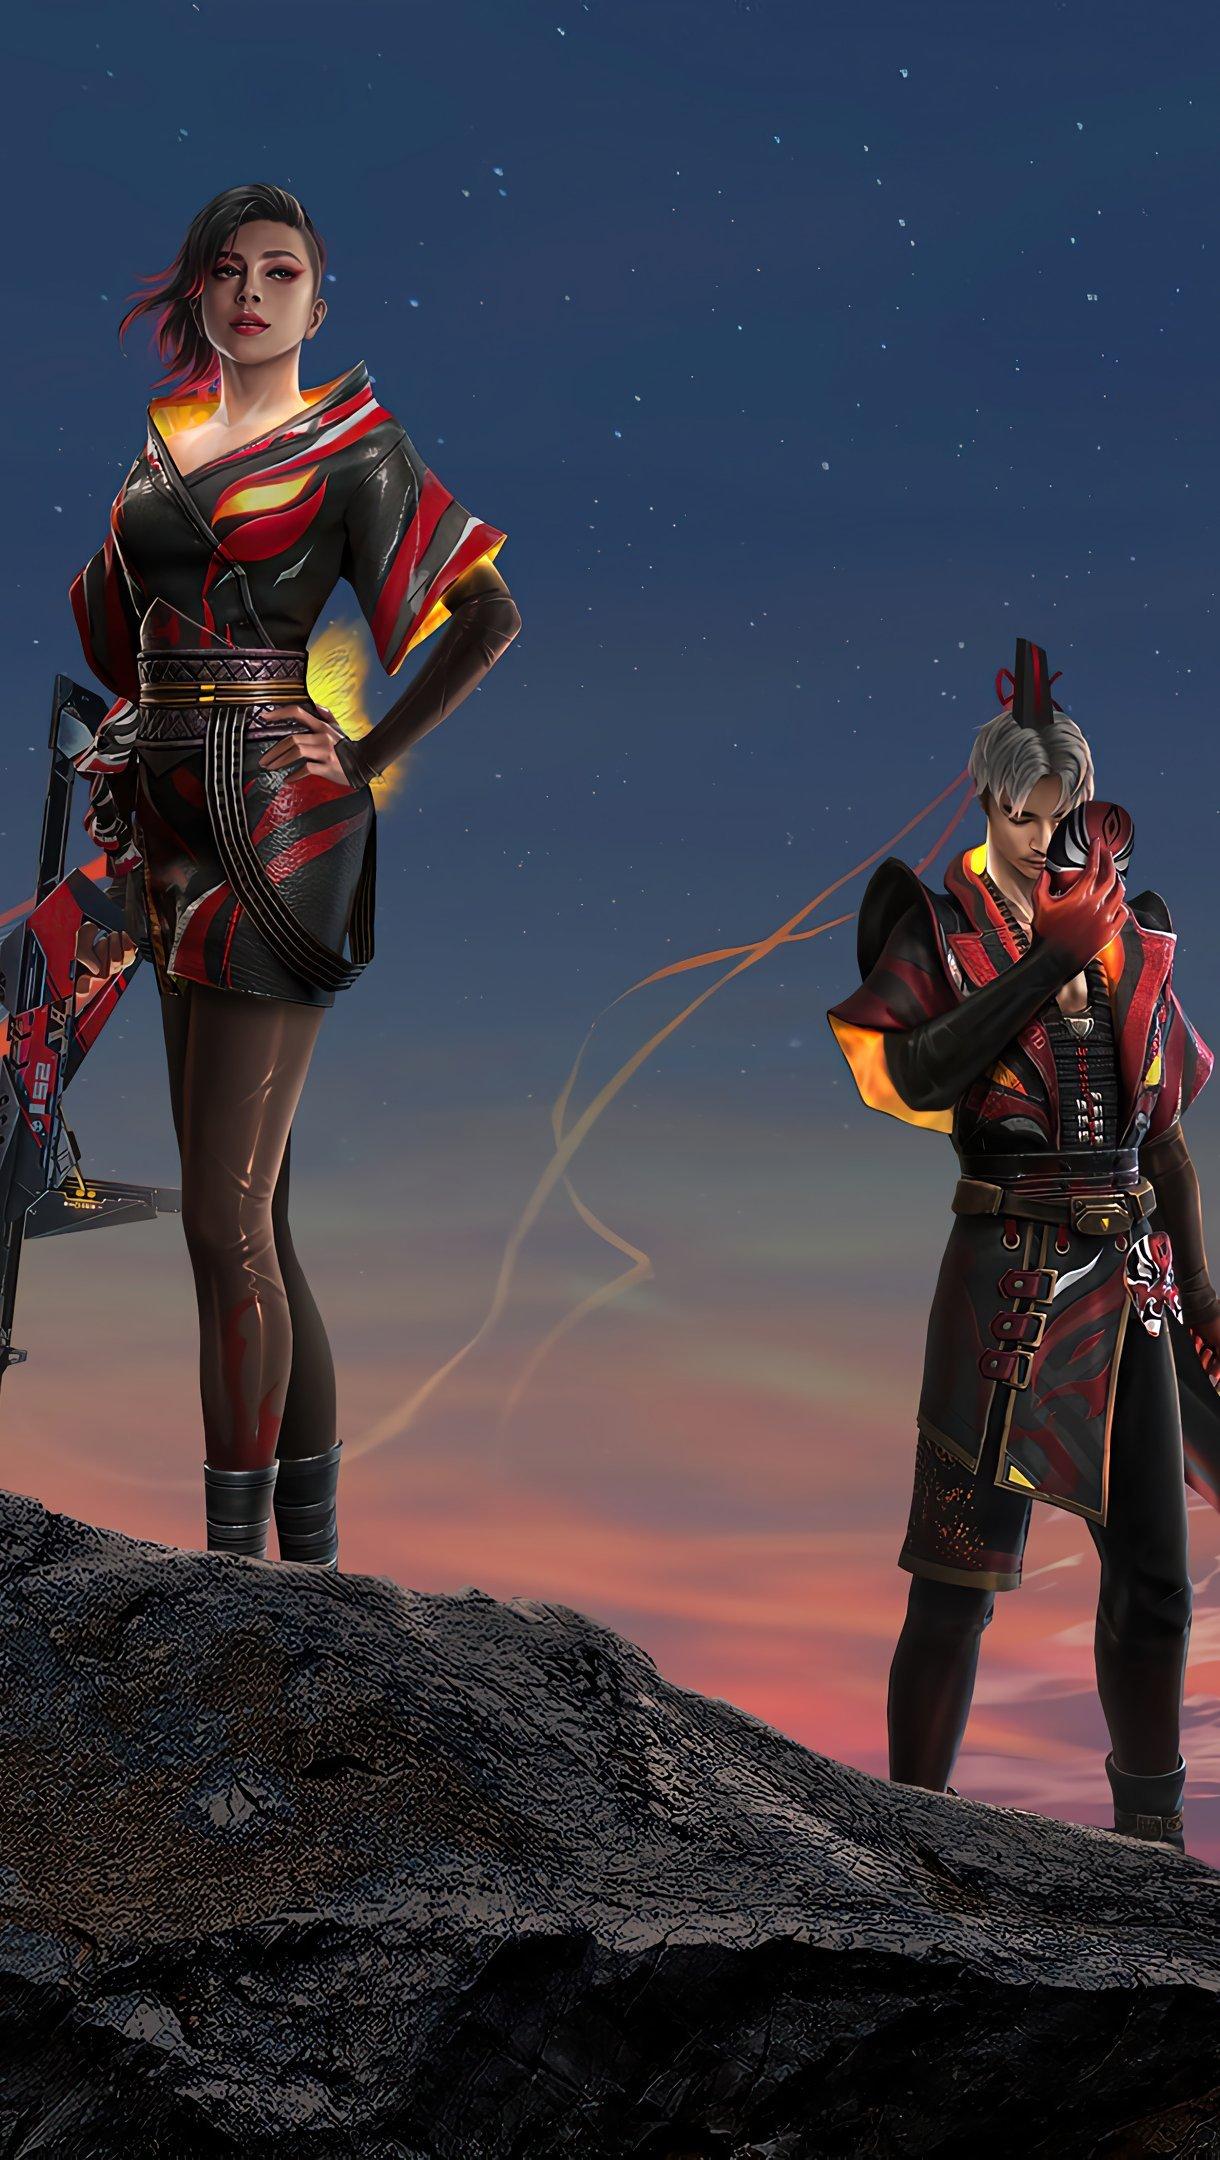 Fondos de pantalla Skins de personajes de Garena Free Fire Vertical